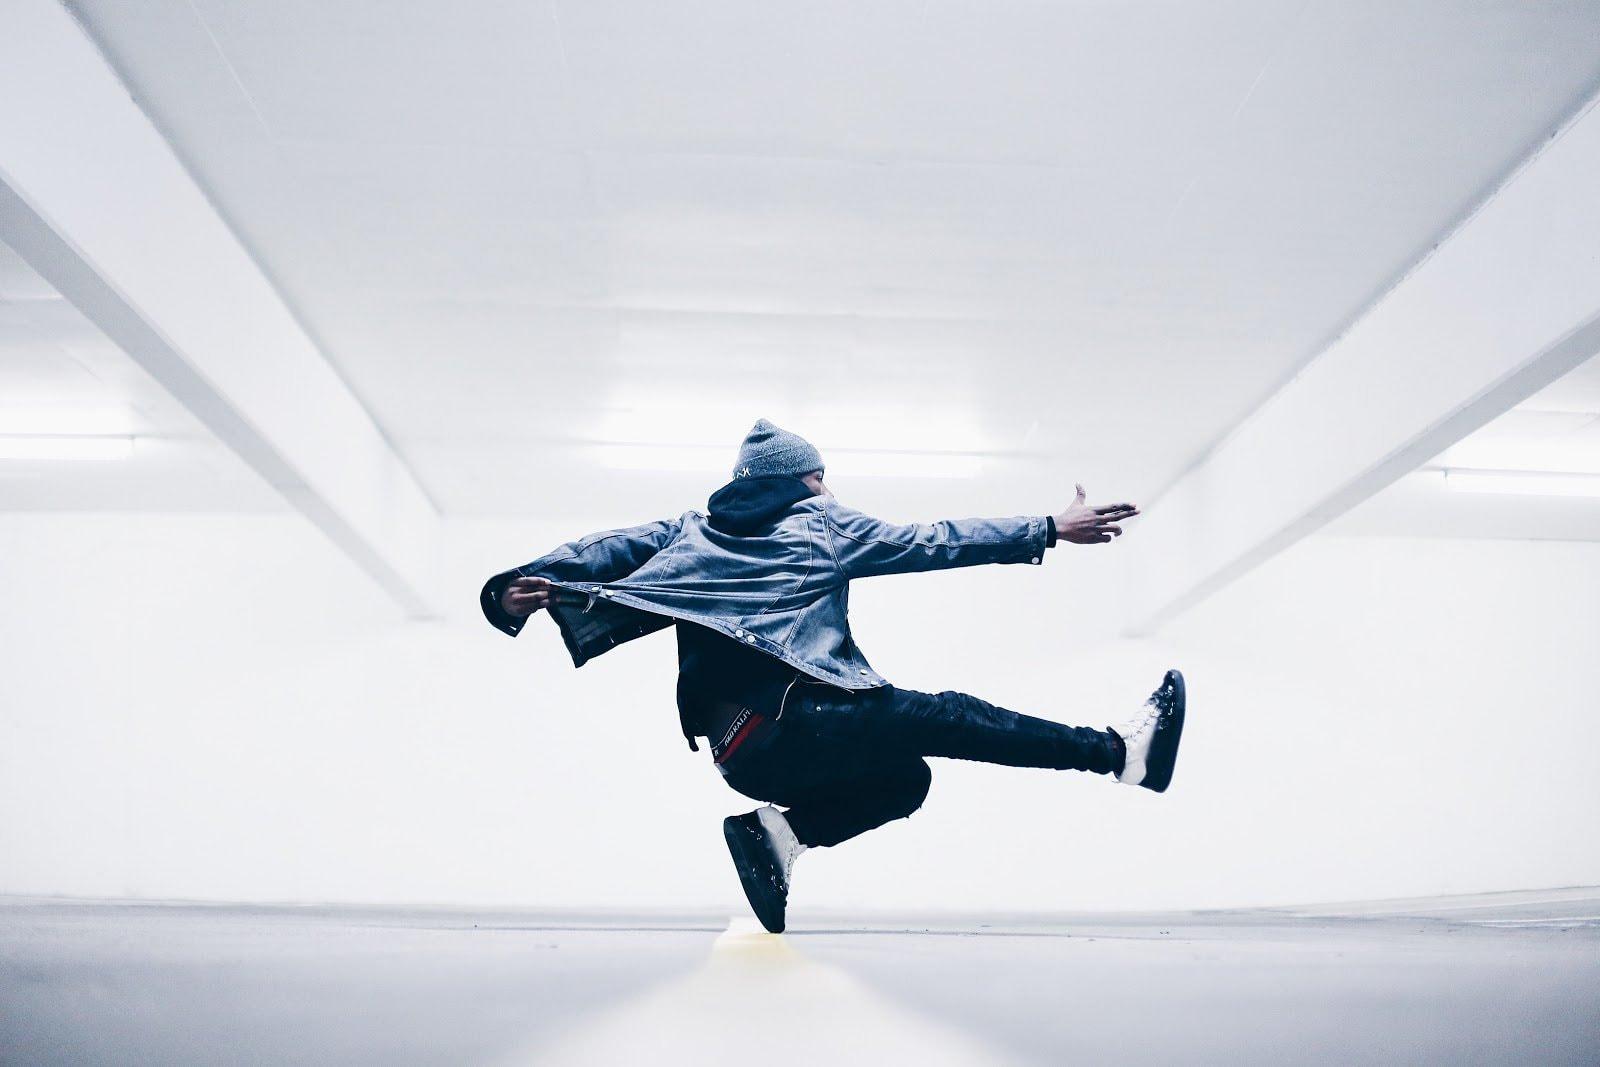 Man jumping by Drew Graham